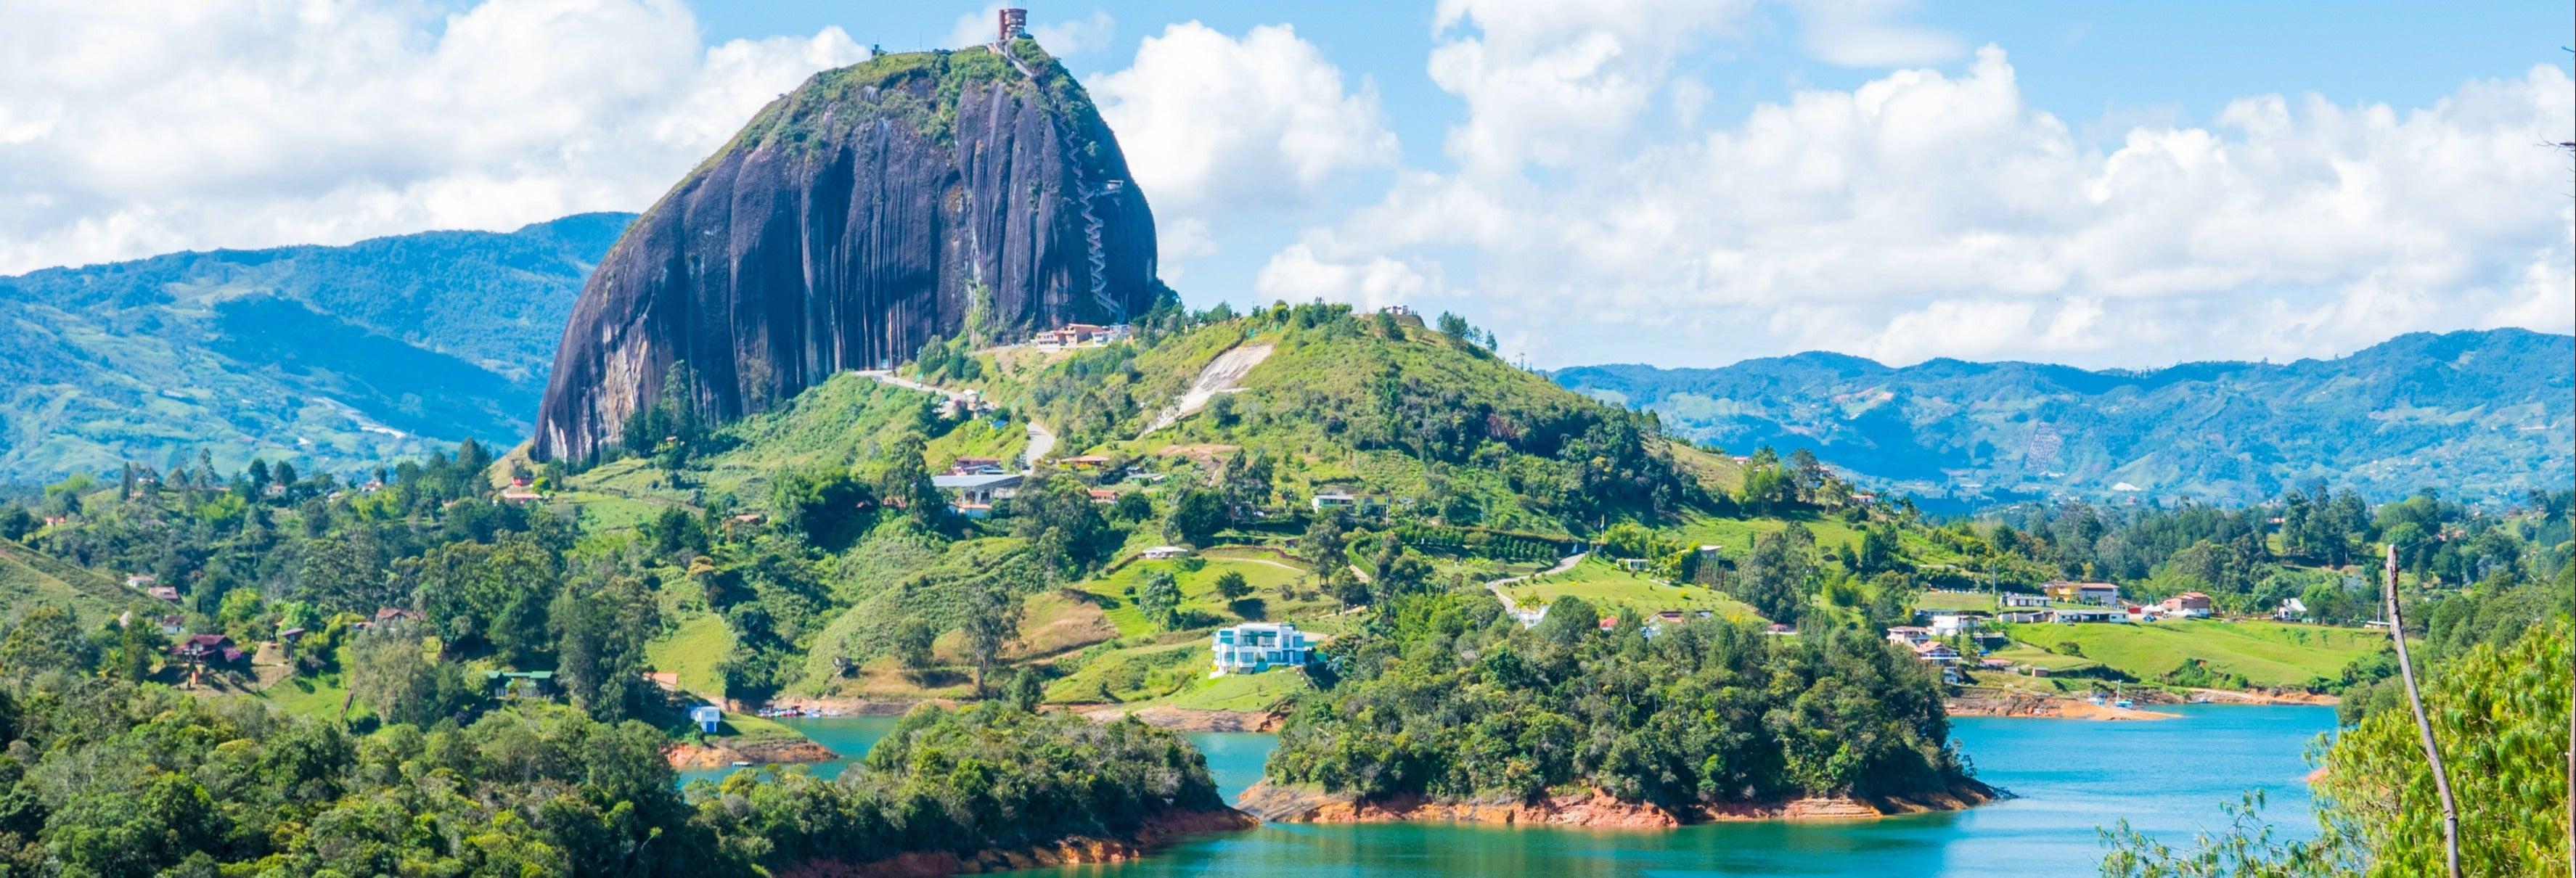 Tour of Guatapé + Boat Ride